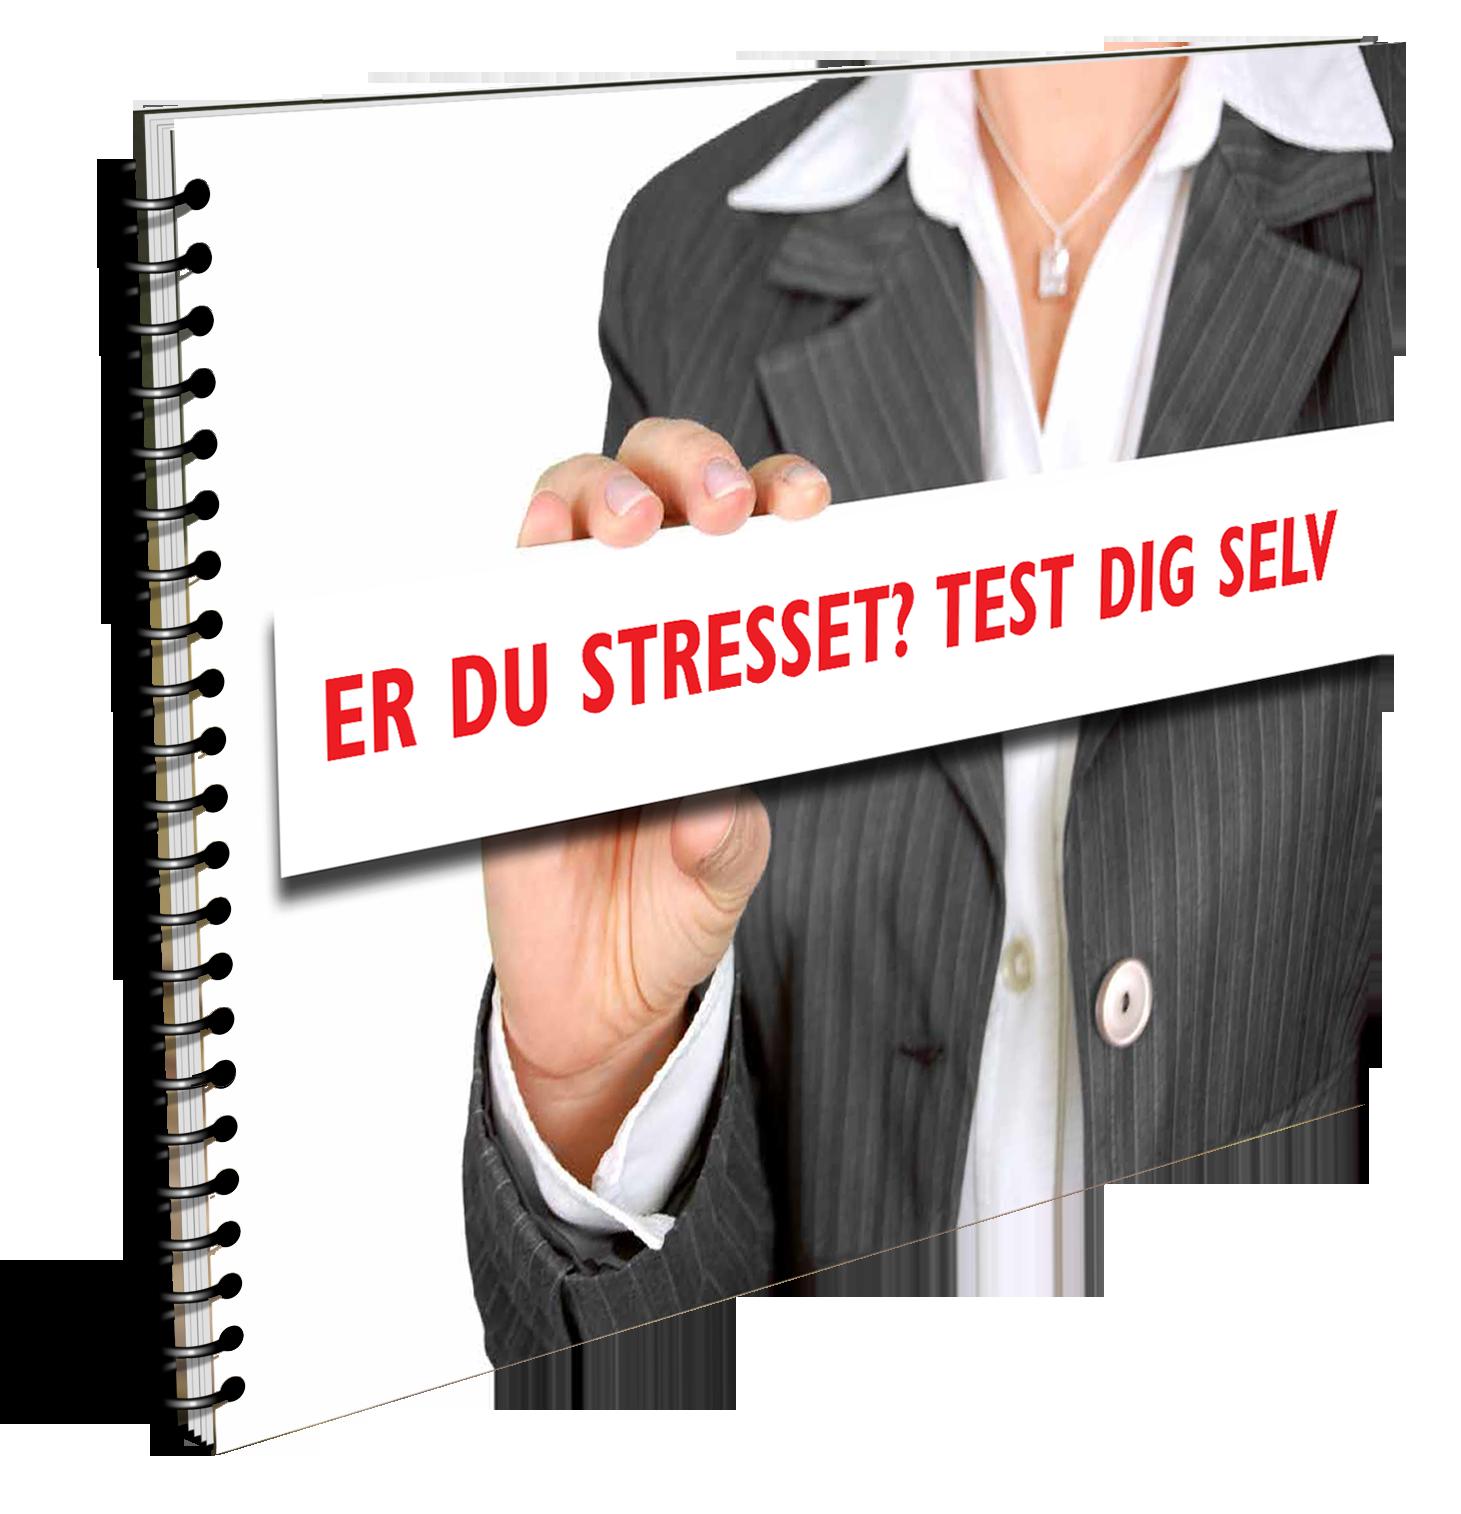 Stressbehandling – Indre ro midt i kaos